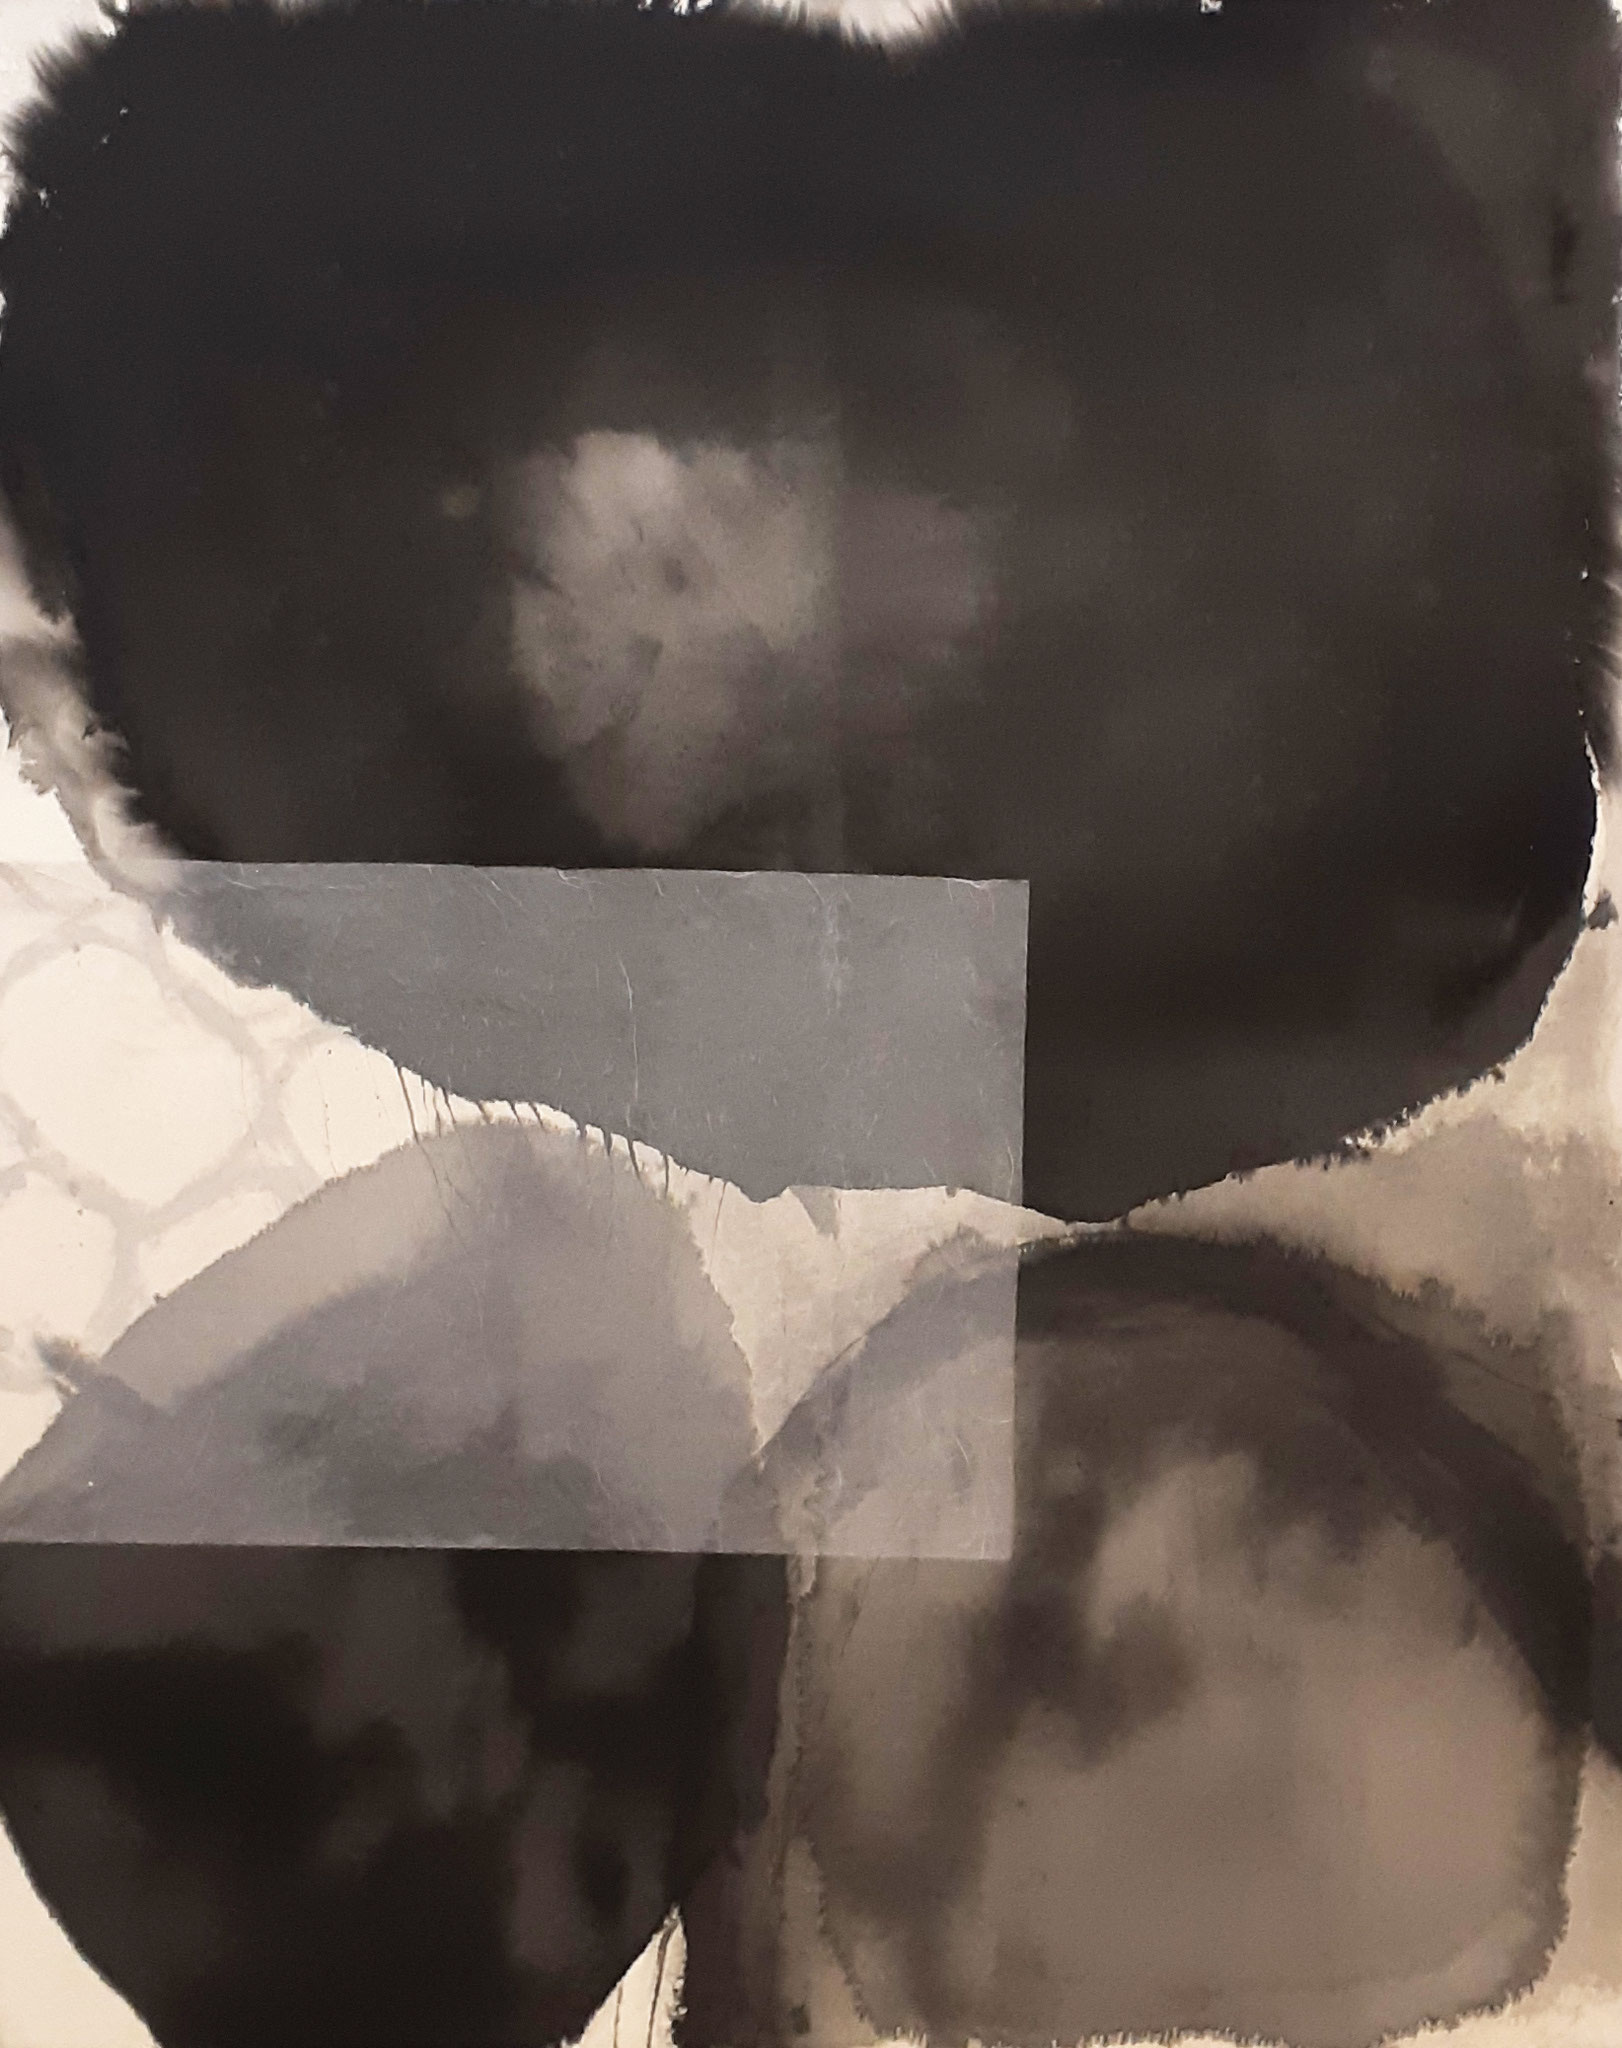 Serie 'Traces' 2020 - Tusche & Seidenpapier auf Leinwand / ink and silk paper on canvas - 110 x 150 cm